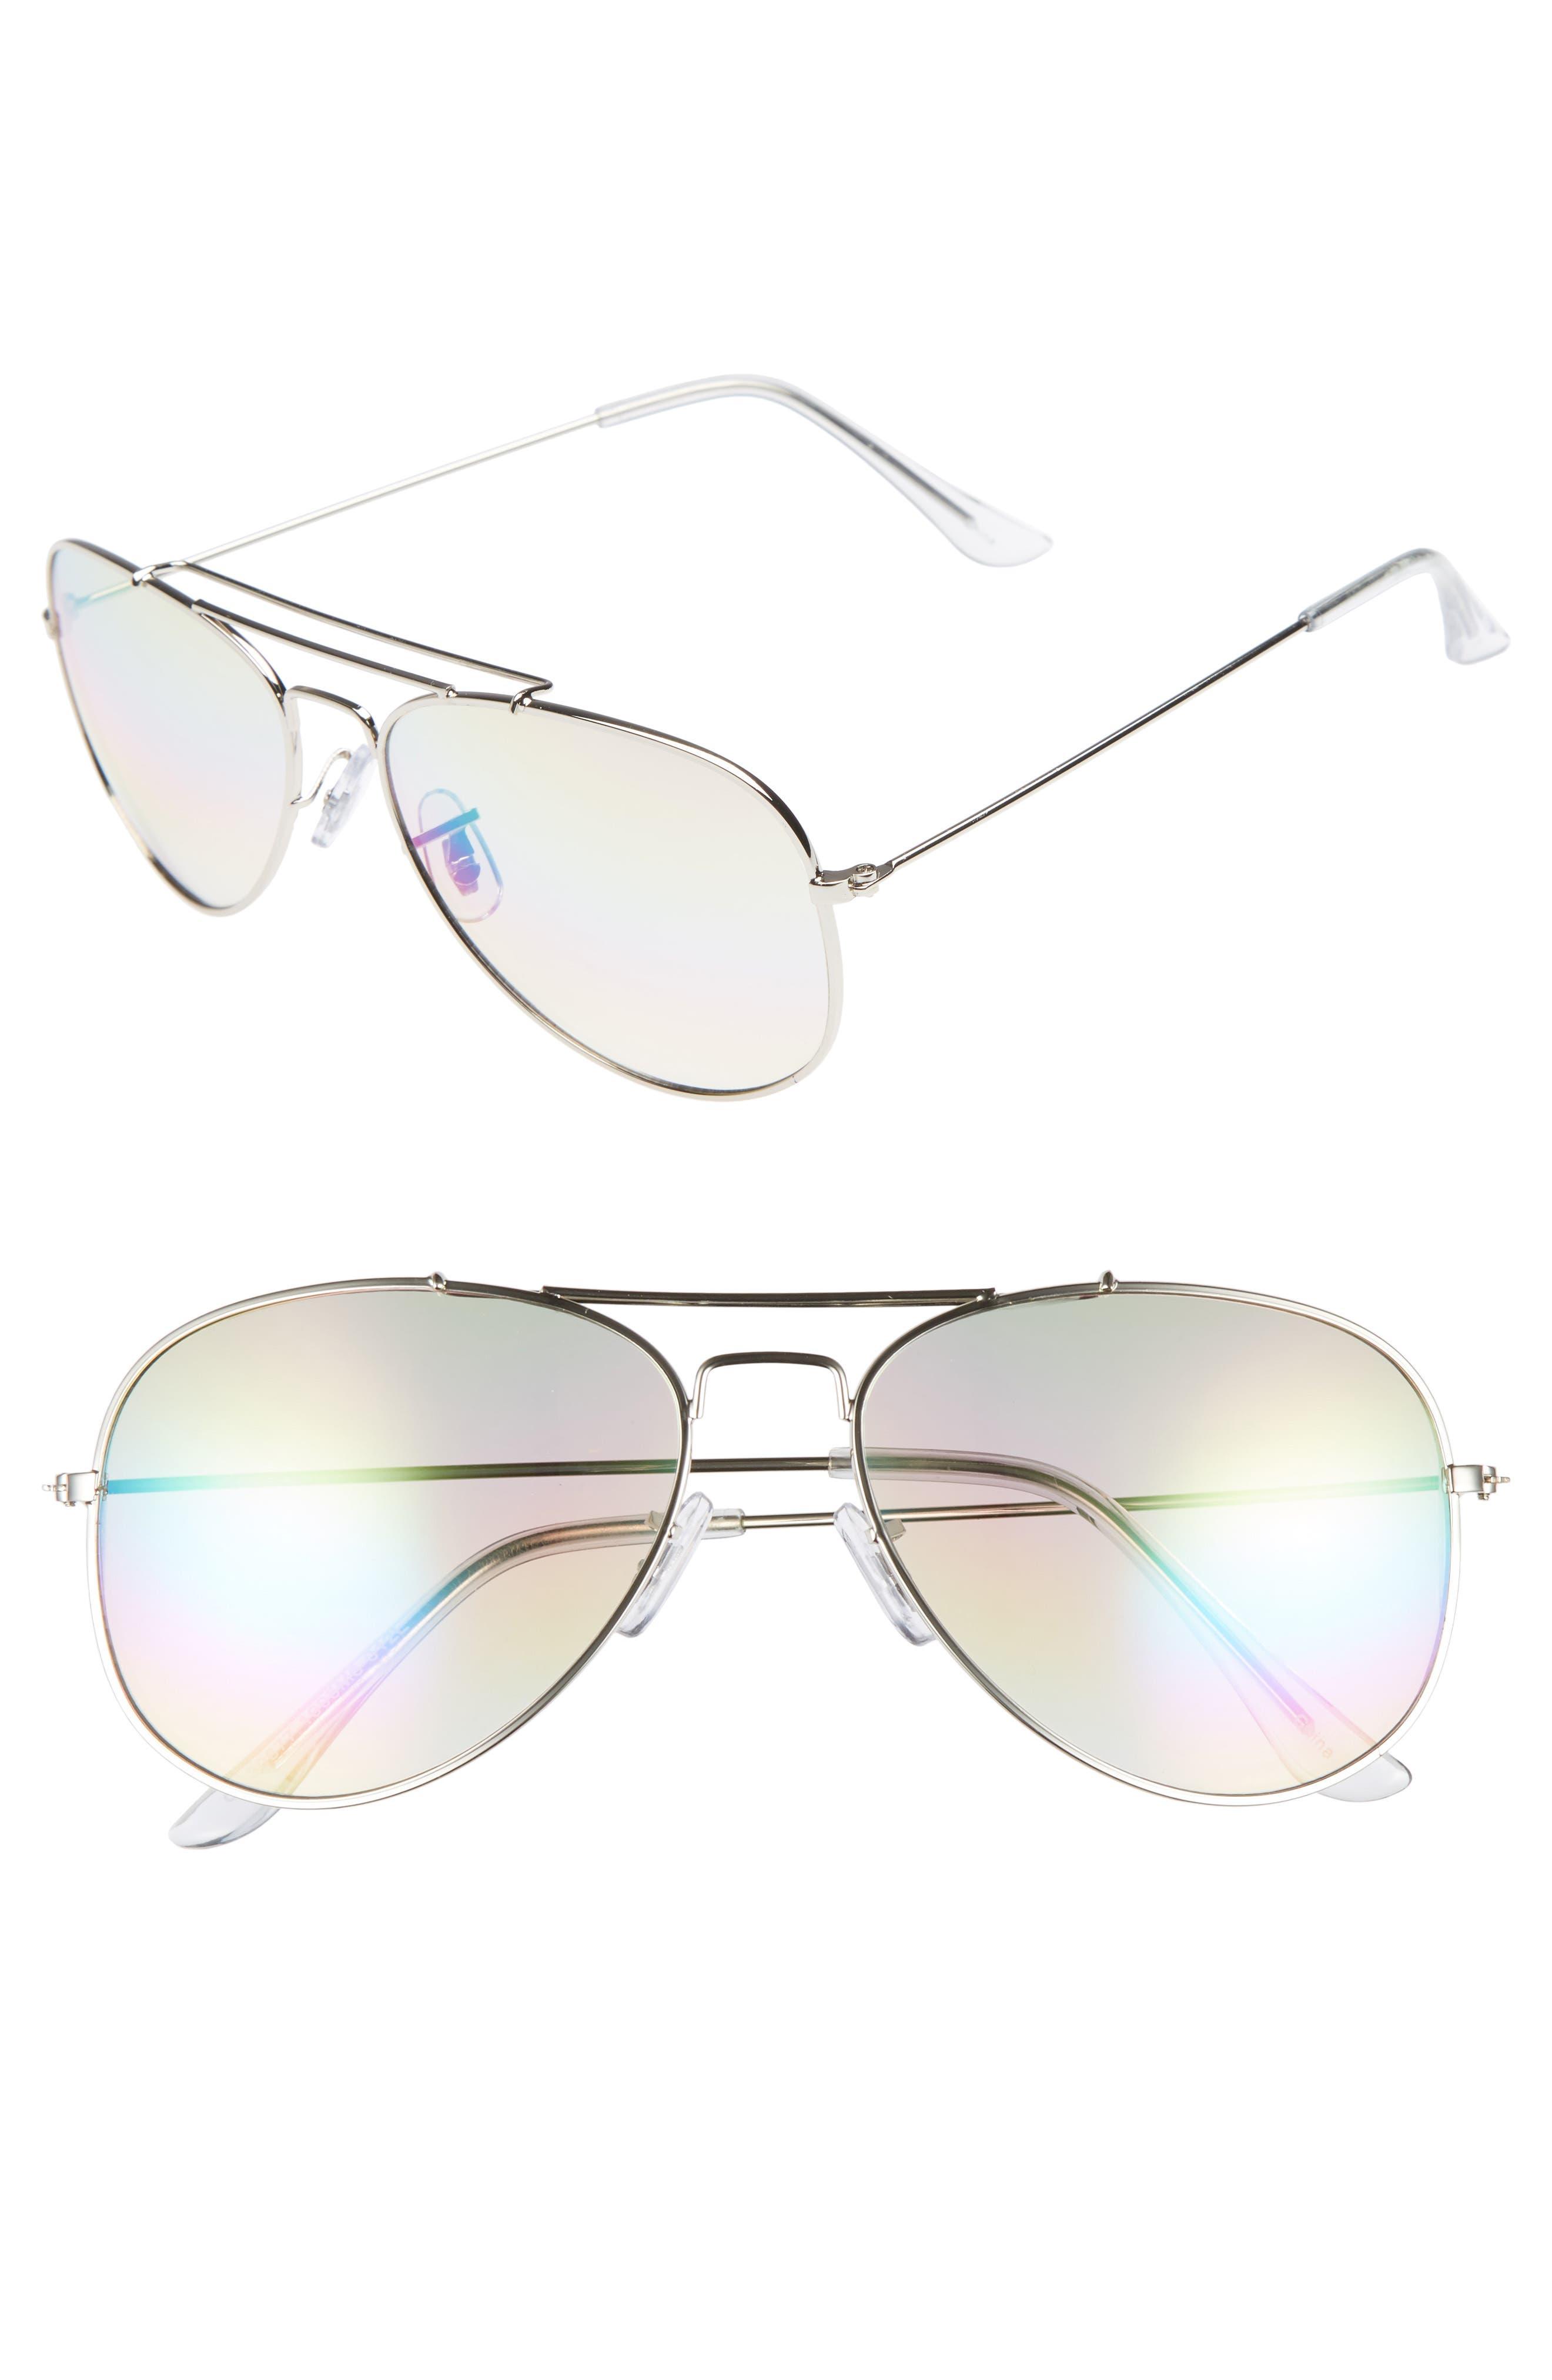 Rainbow Aviator Sunglasses,                             Main thumbnail 1, color,                             040